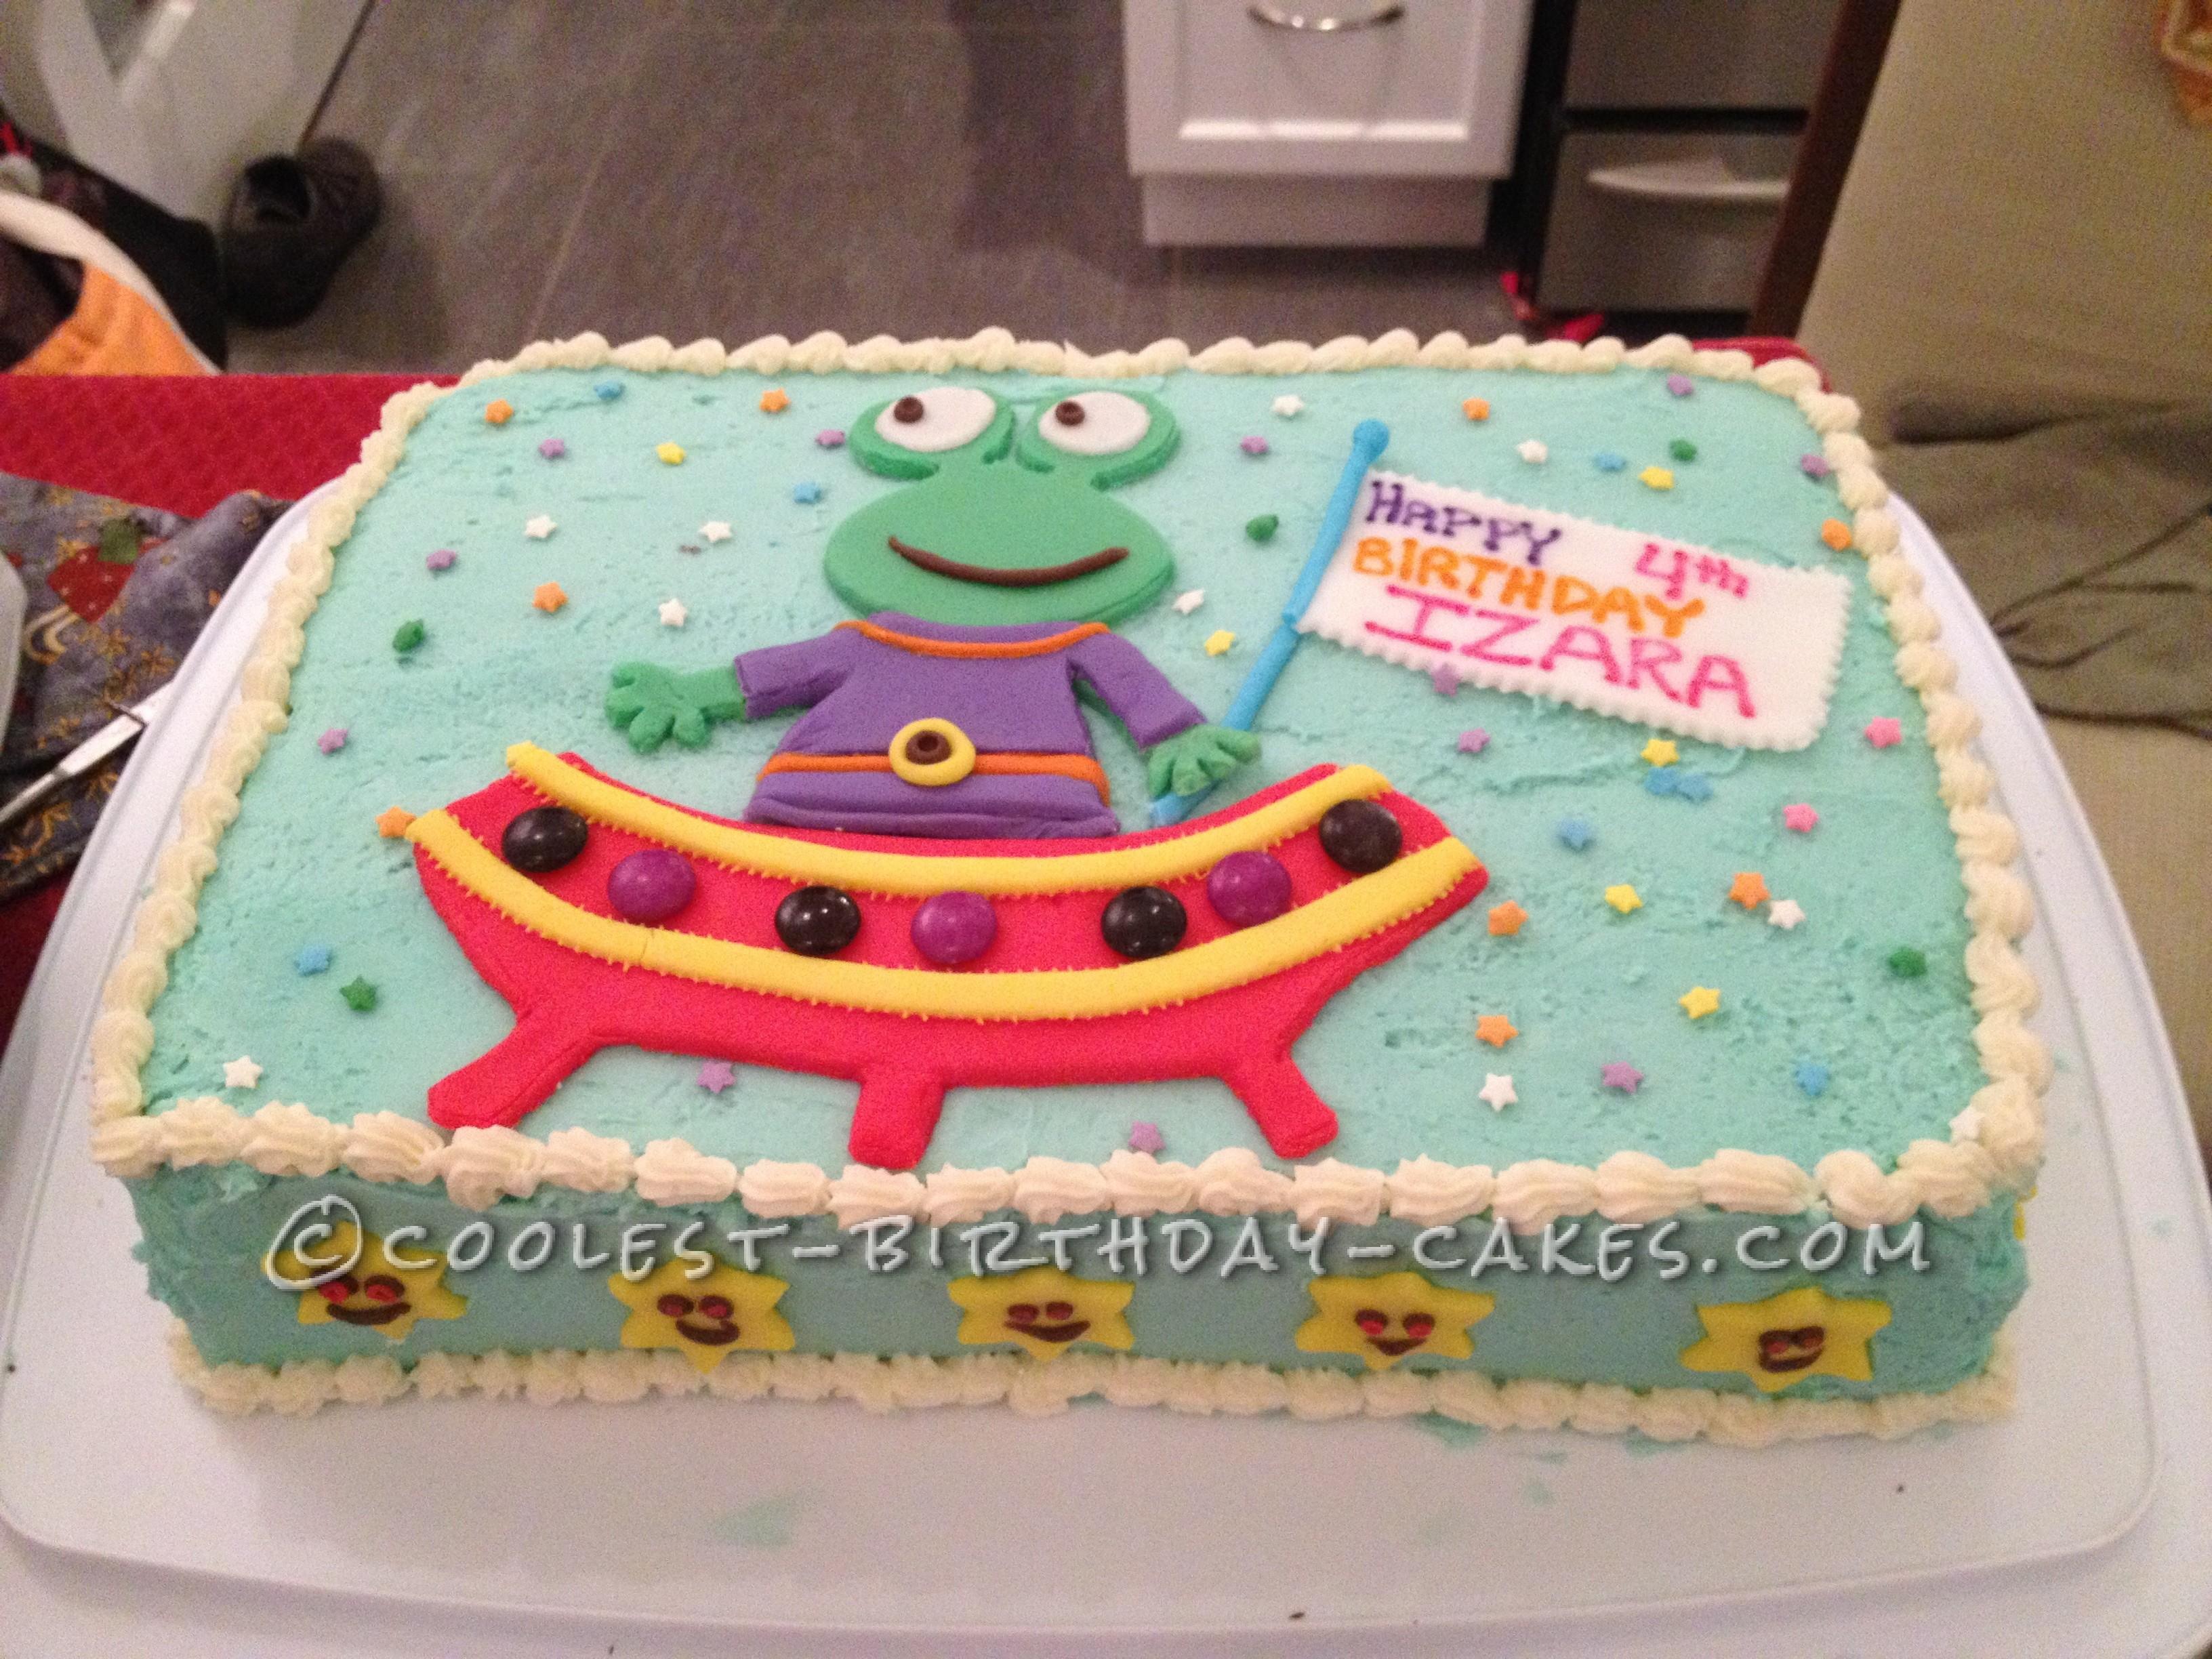 Coolest Alien Birthday Cake